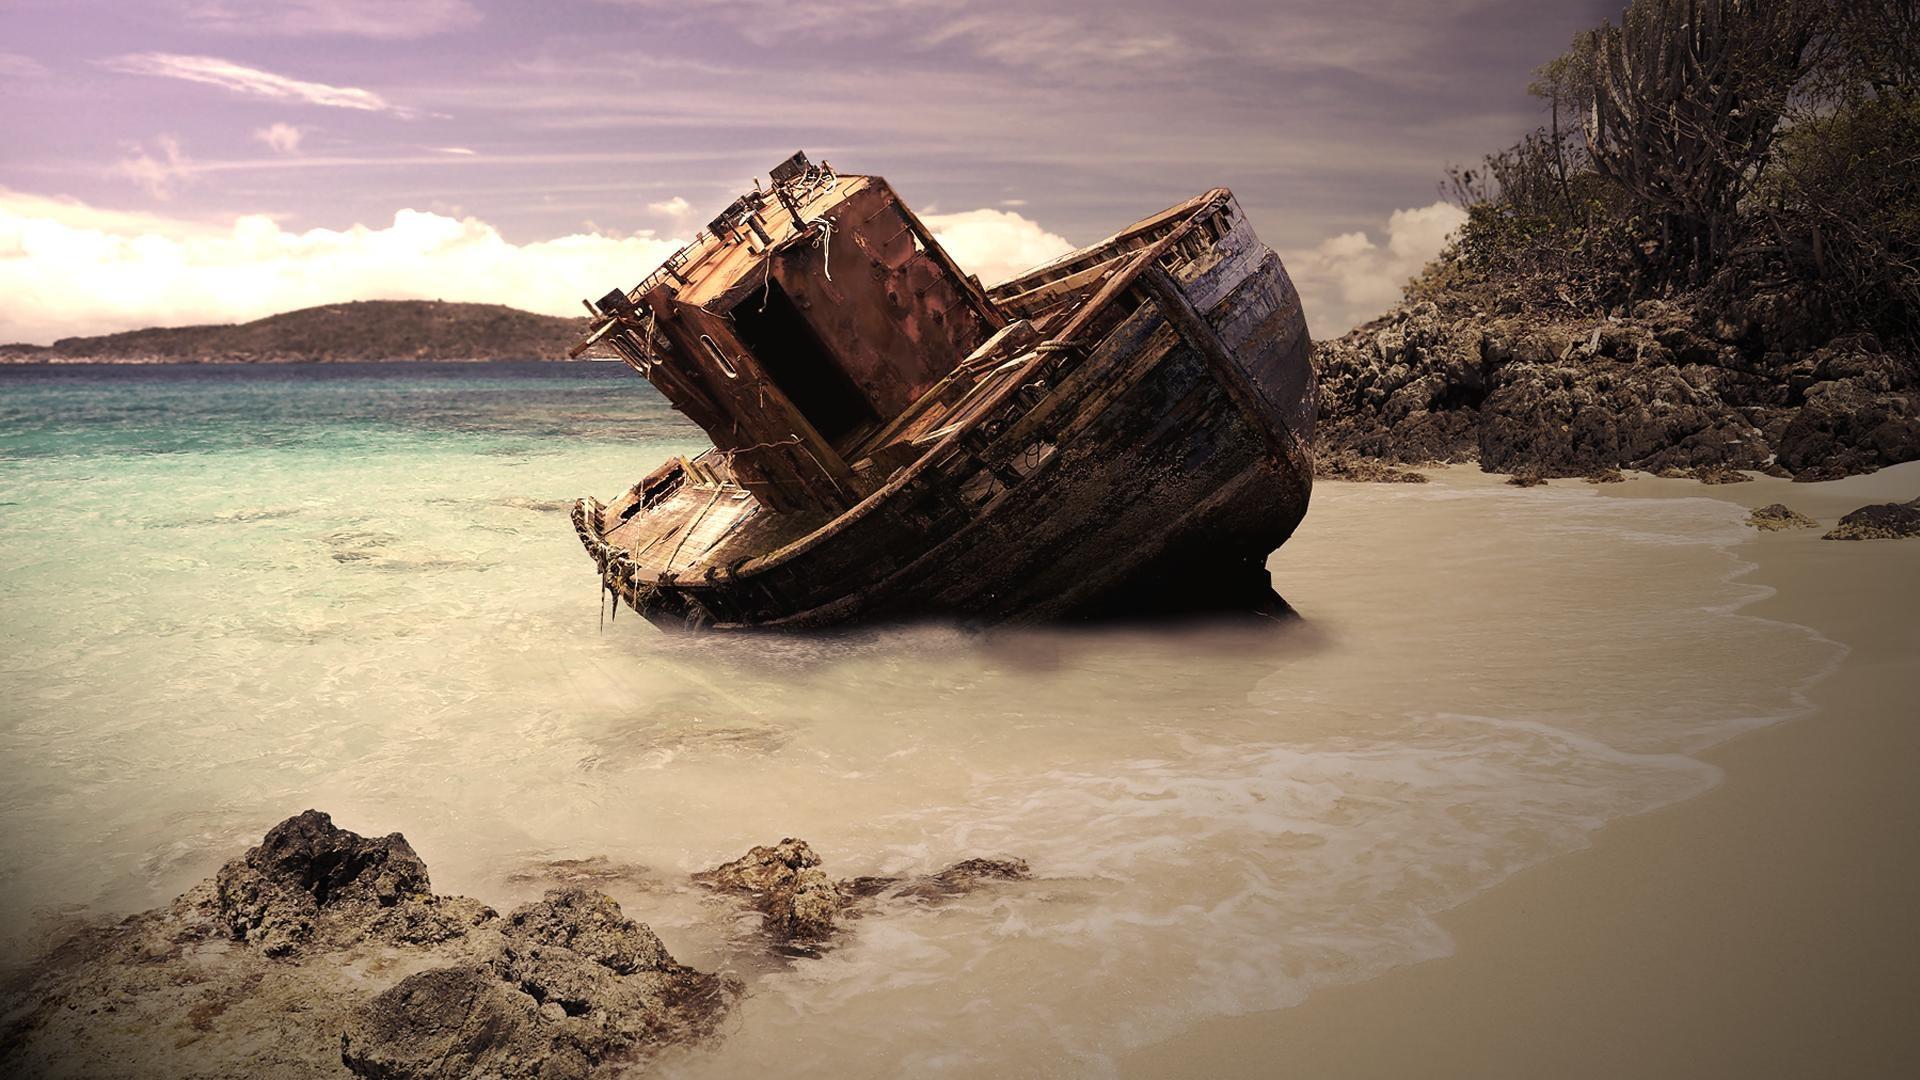 Wallpaper HD Download nature Landscape Water Sea